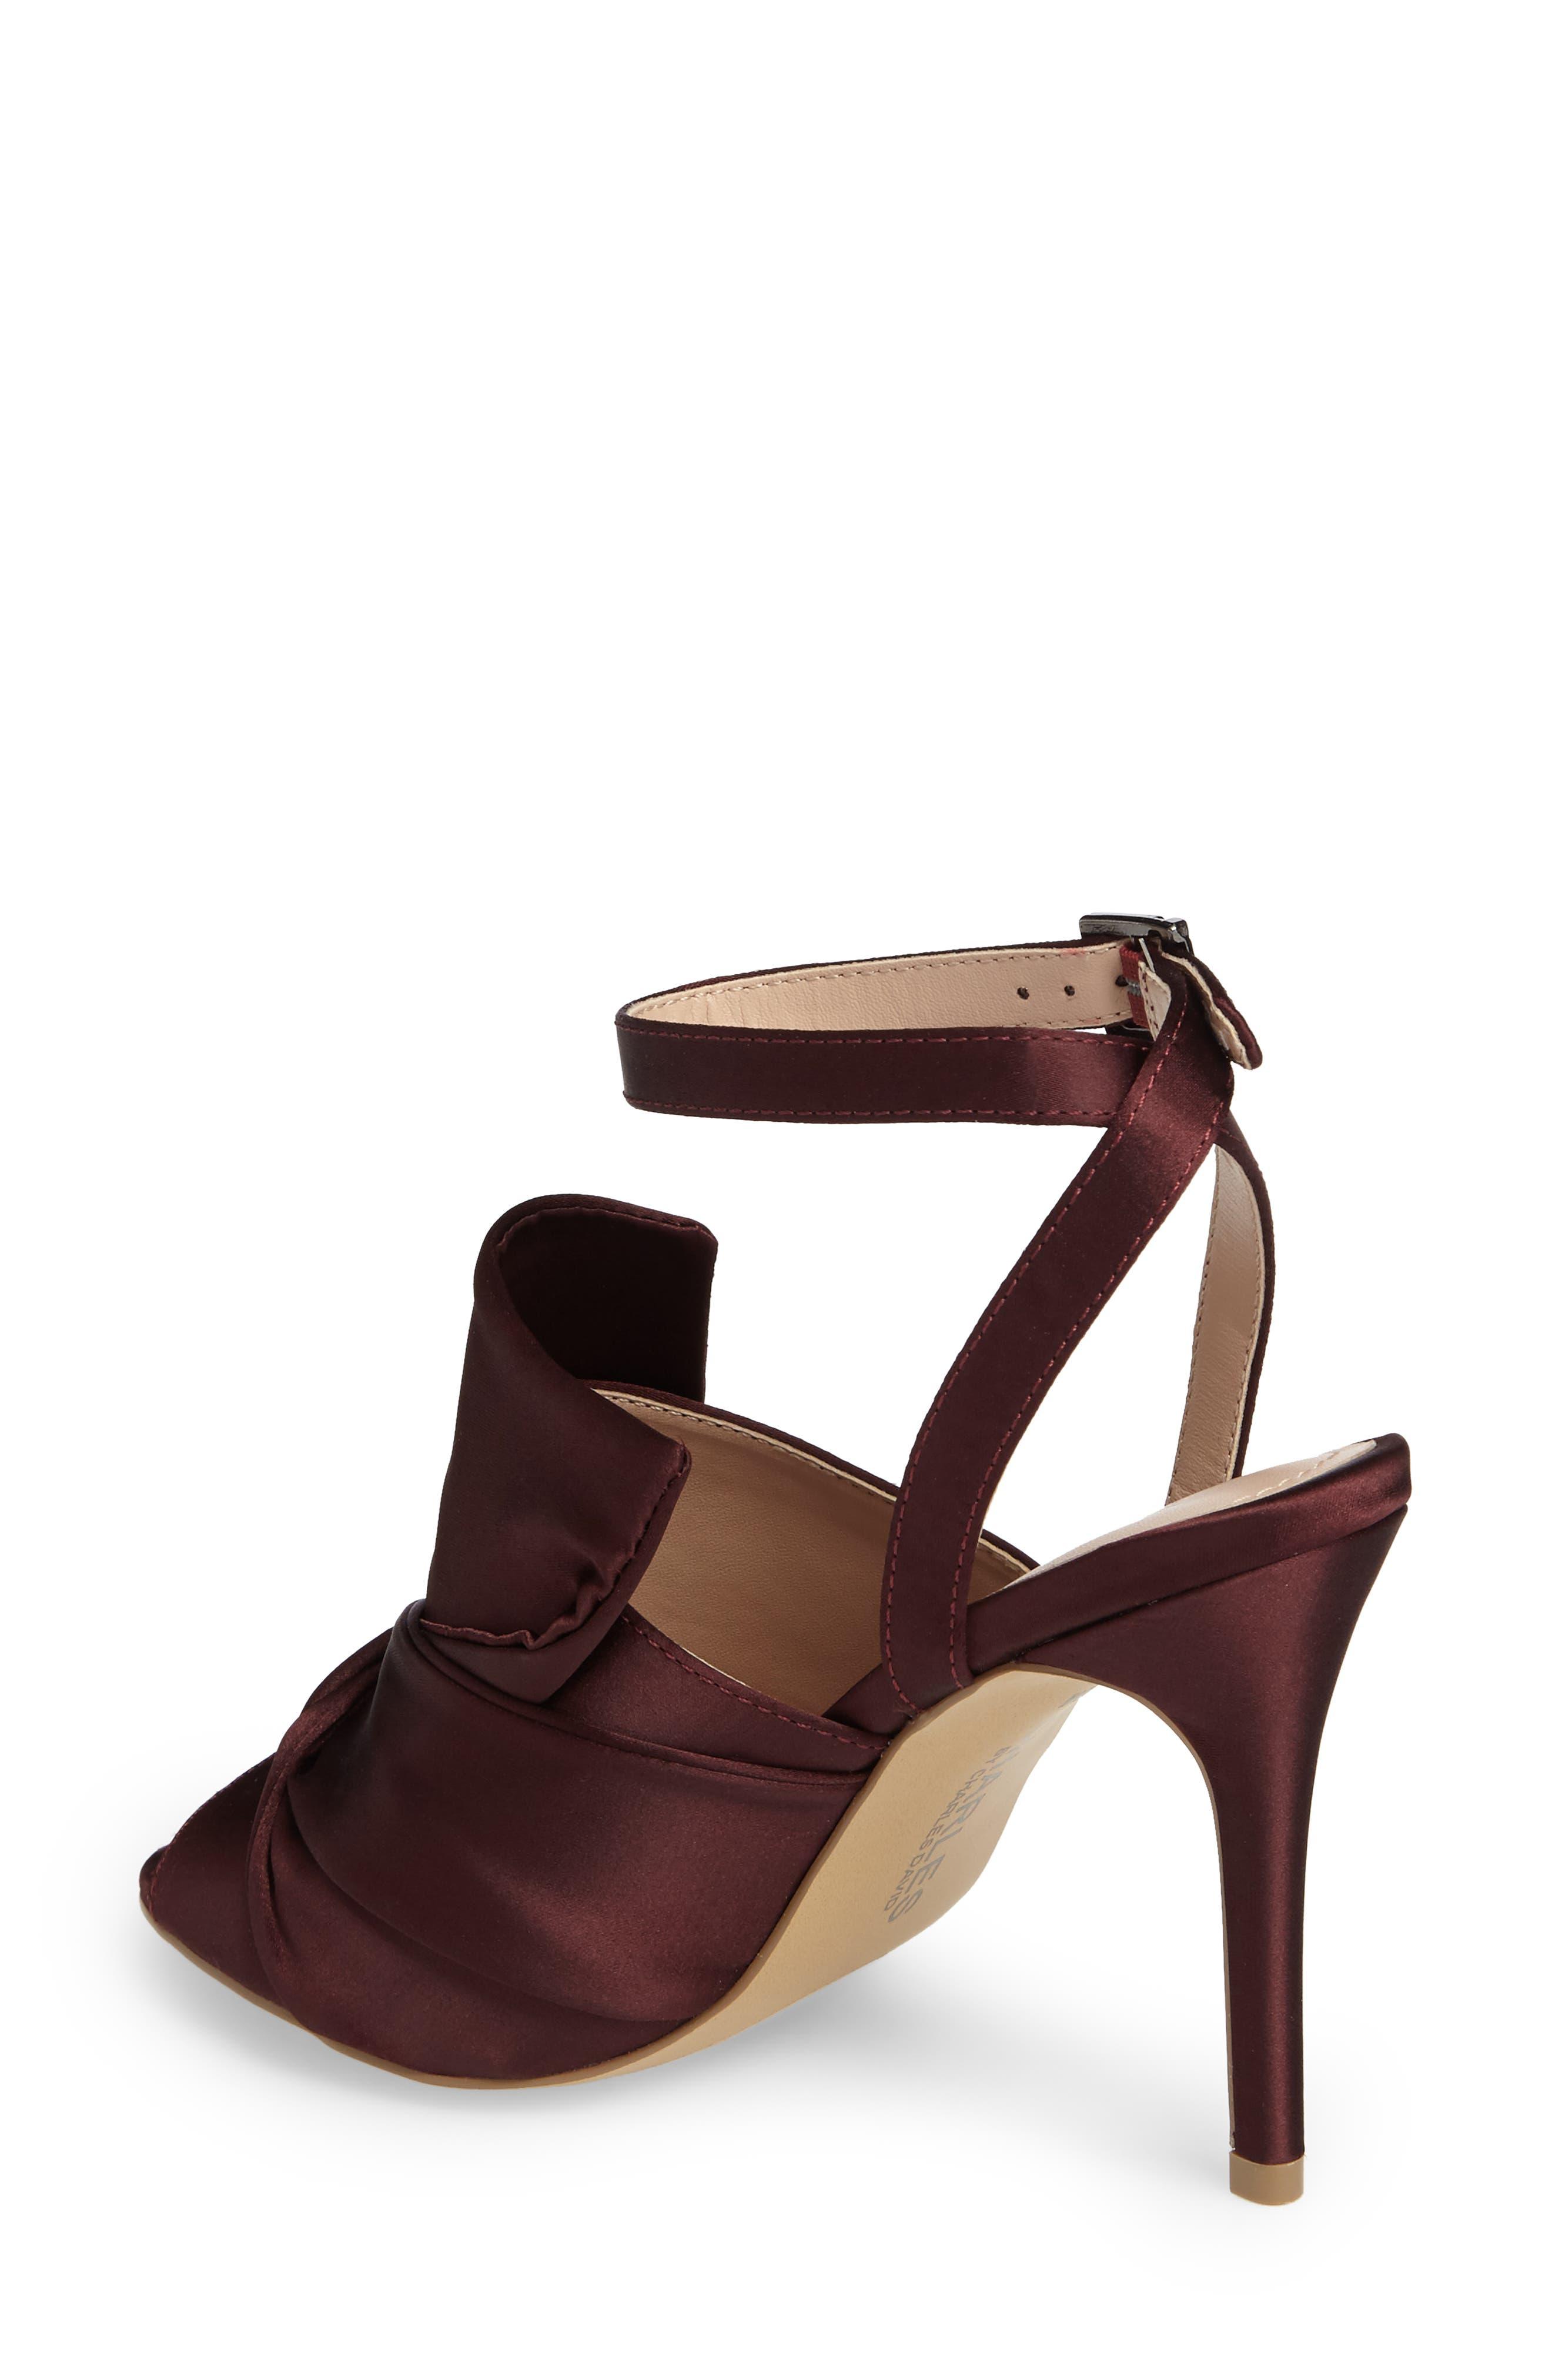 Rachel Ankle Strap Sandal,                             Alternate thumbnail 6, color,